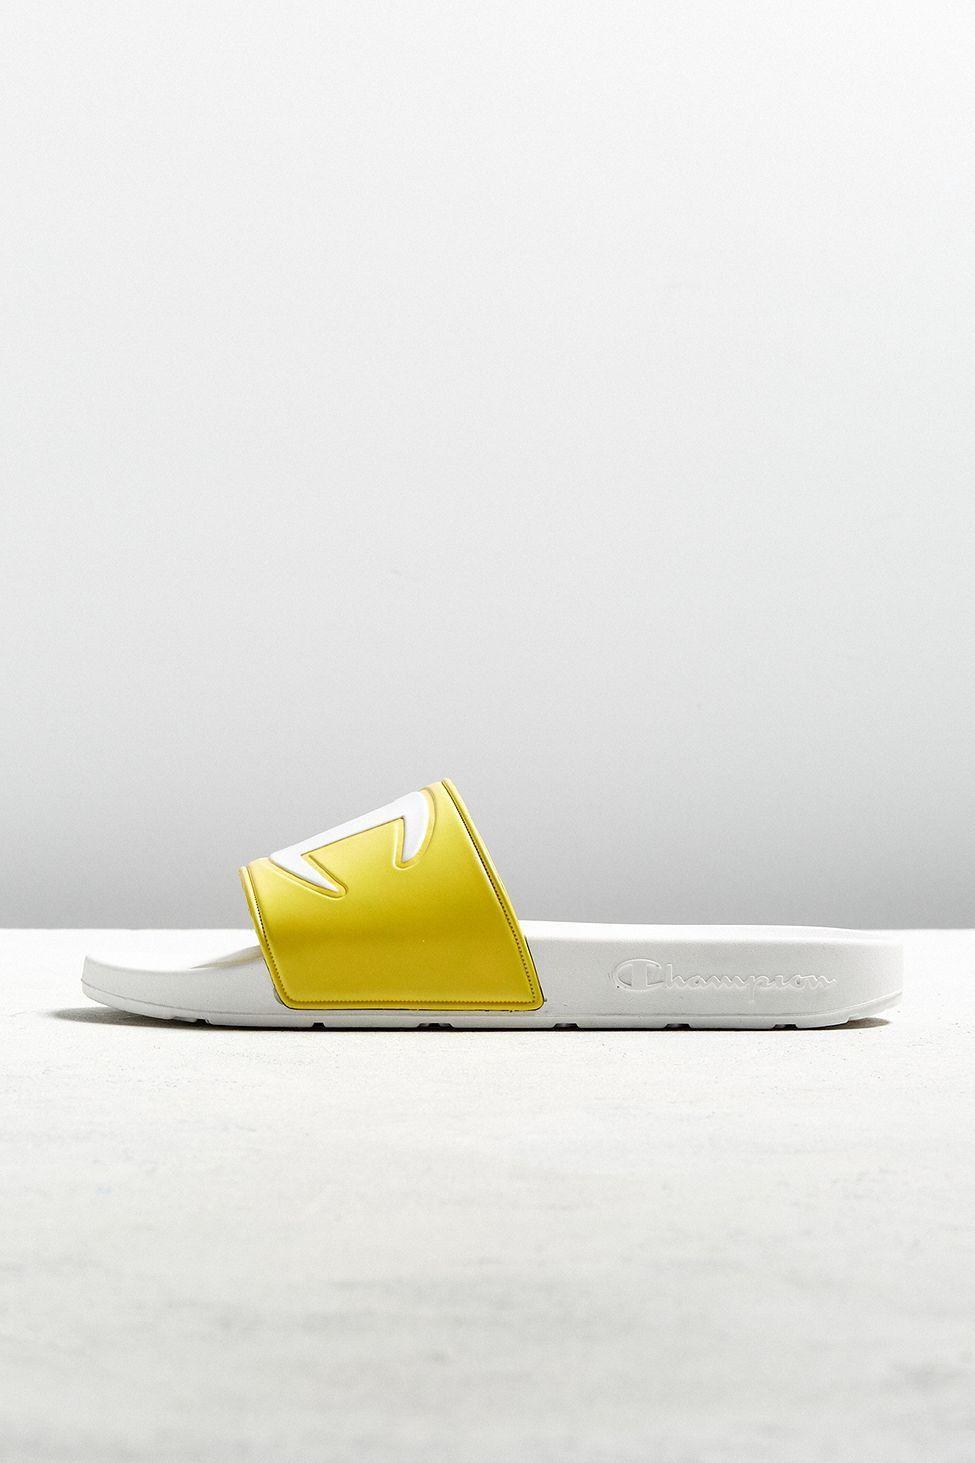 c5c004585553a Urban Outfitters Champion Big C Logo Slide Sandal - Yellow 12 ...